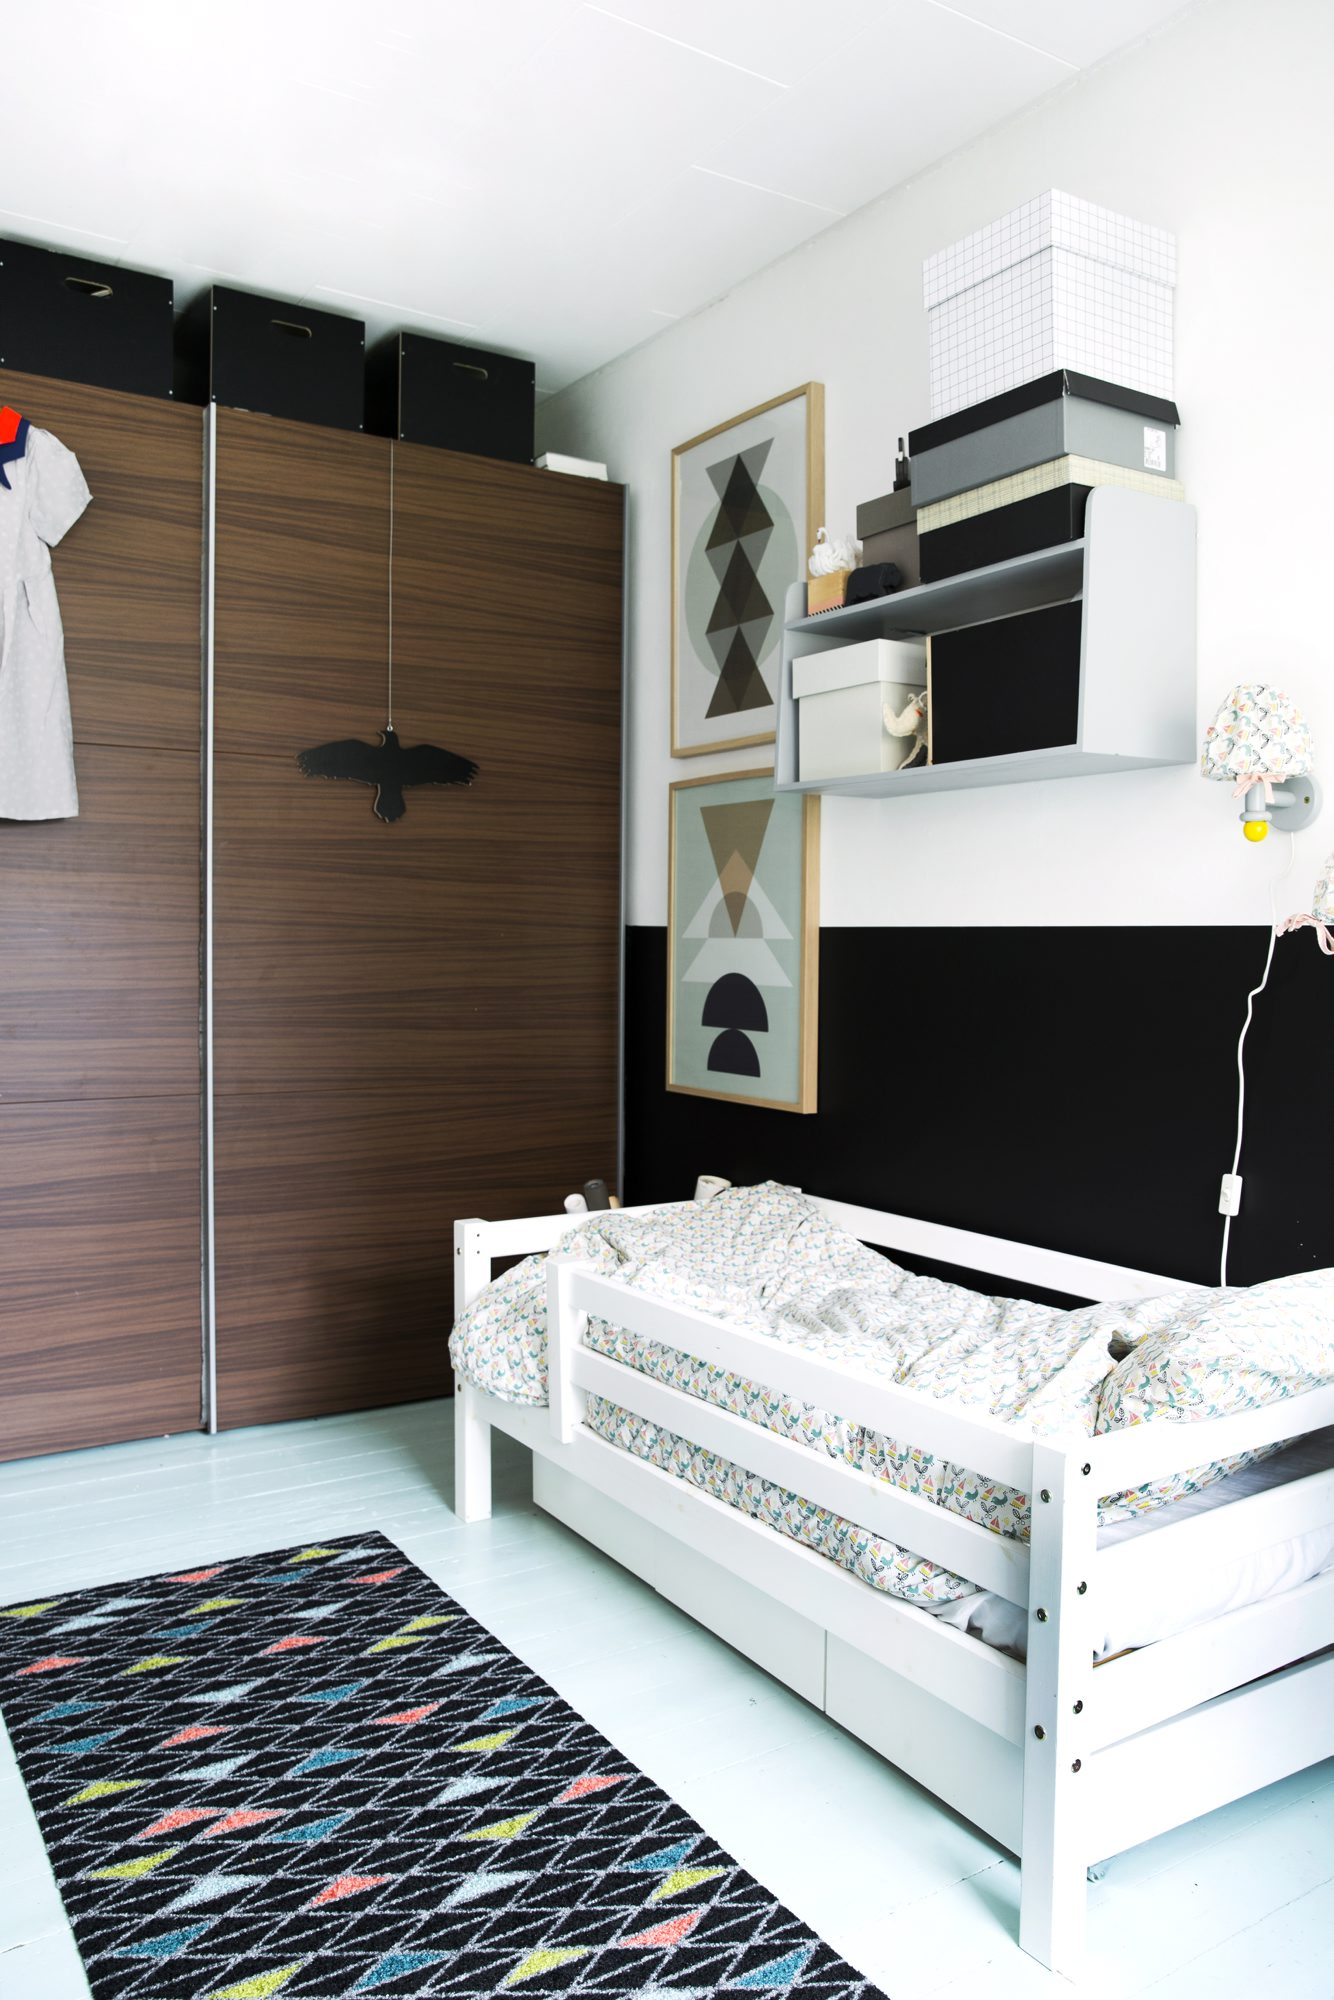 oppussing barnerom plass nedfellbar seng